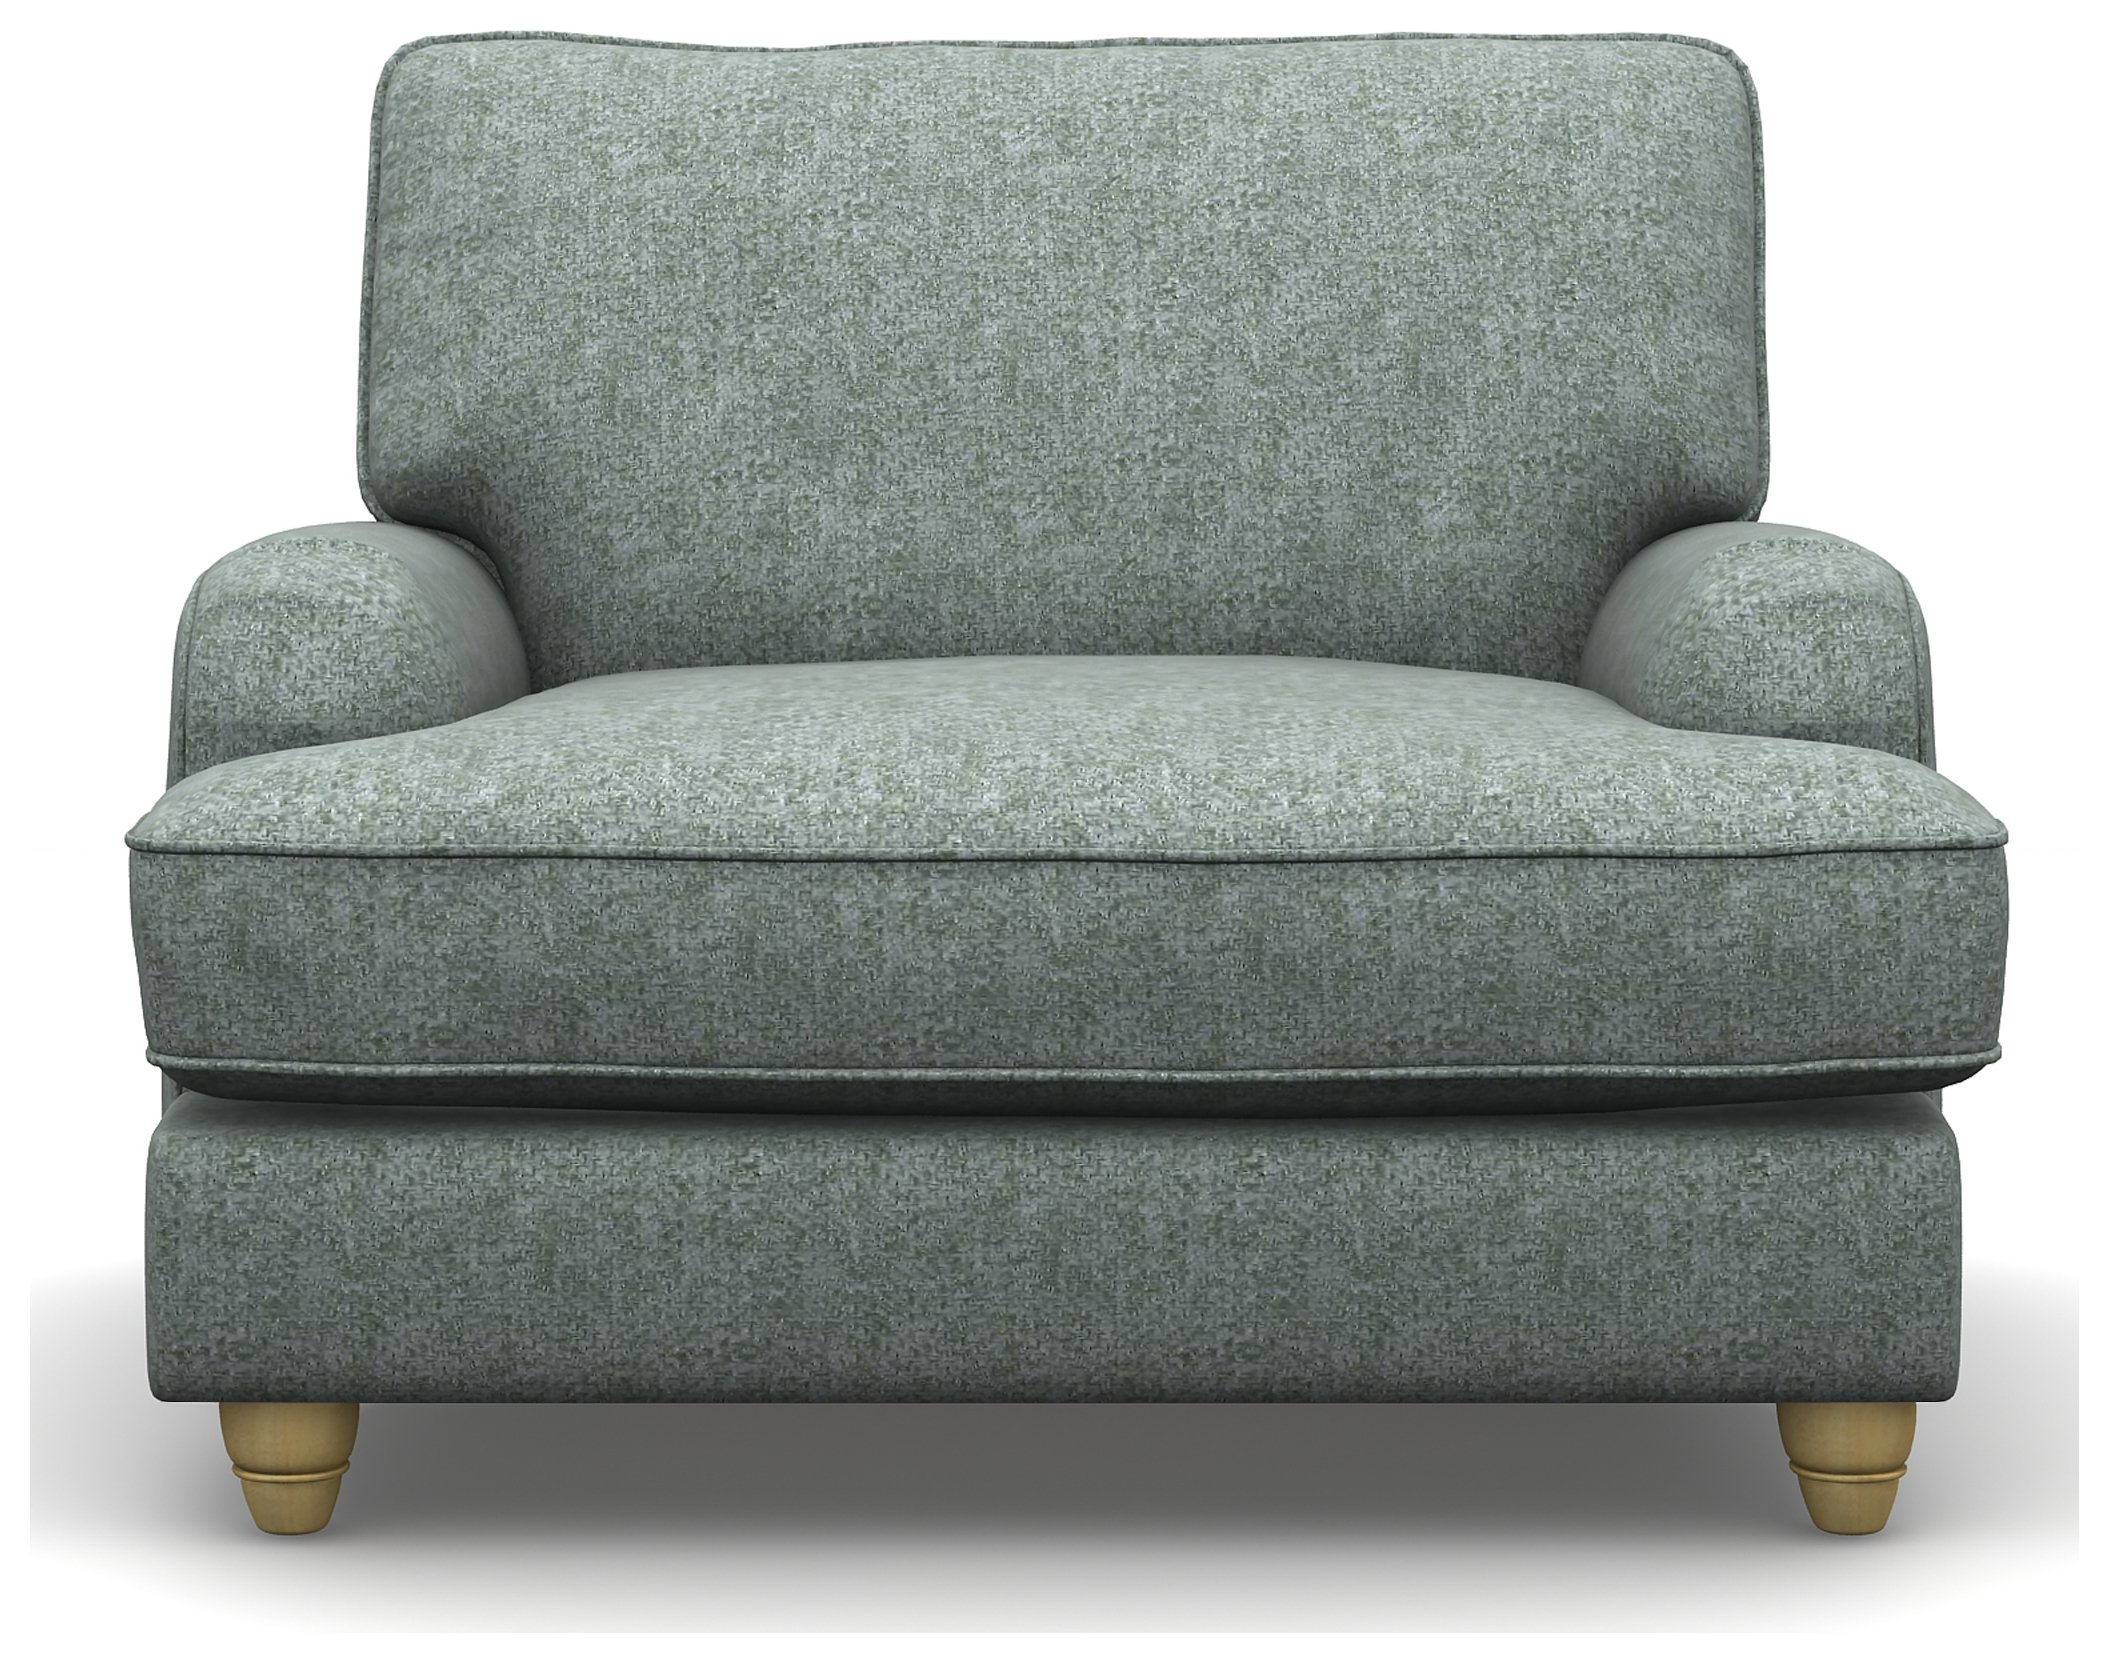 Heart of House Adeline Duck Egg Tweed Fabric Chair